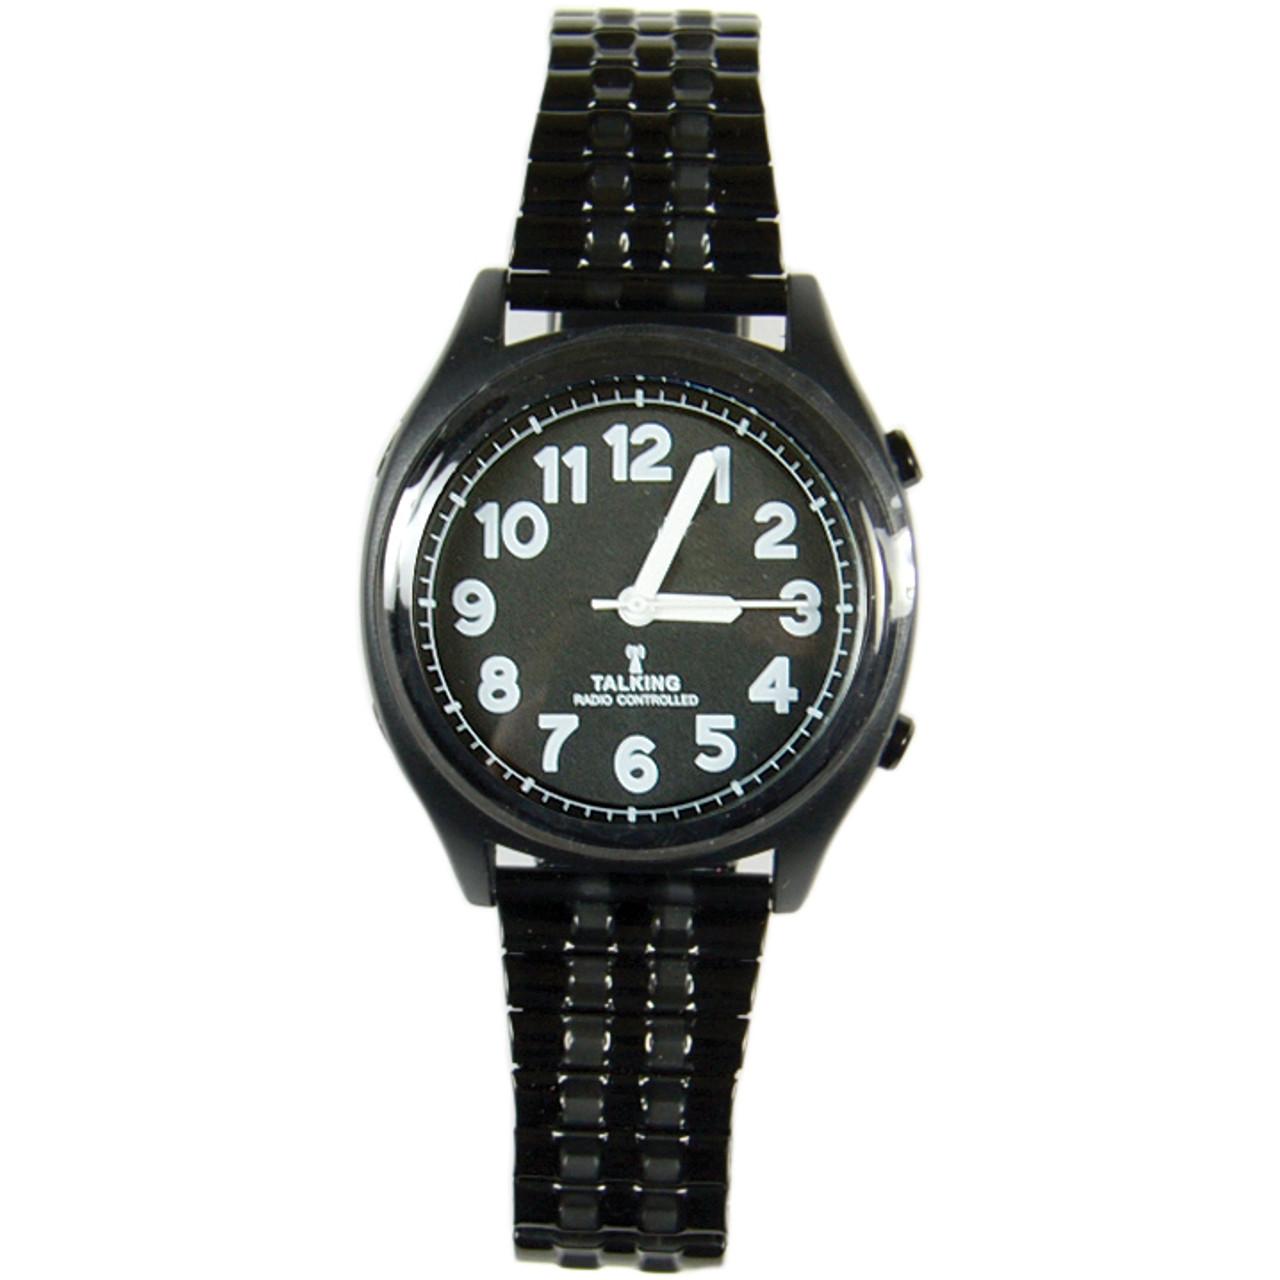 High Contrast Talking Atomic Watch - White on Black